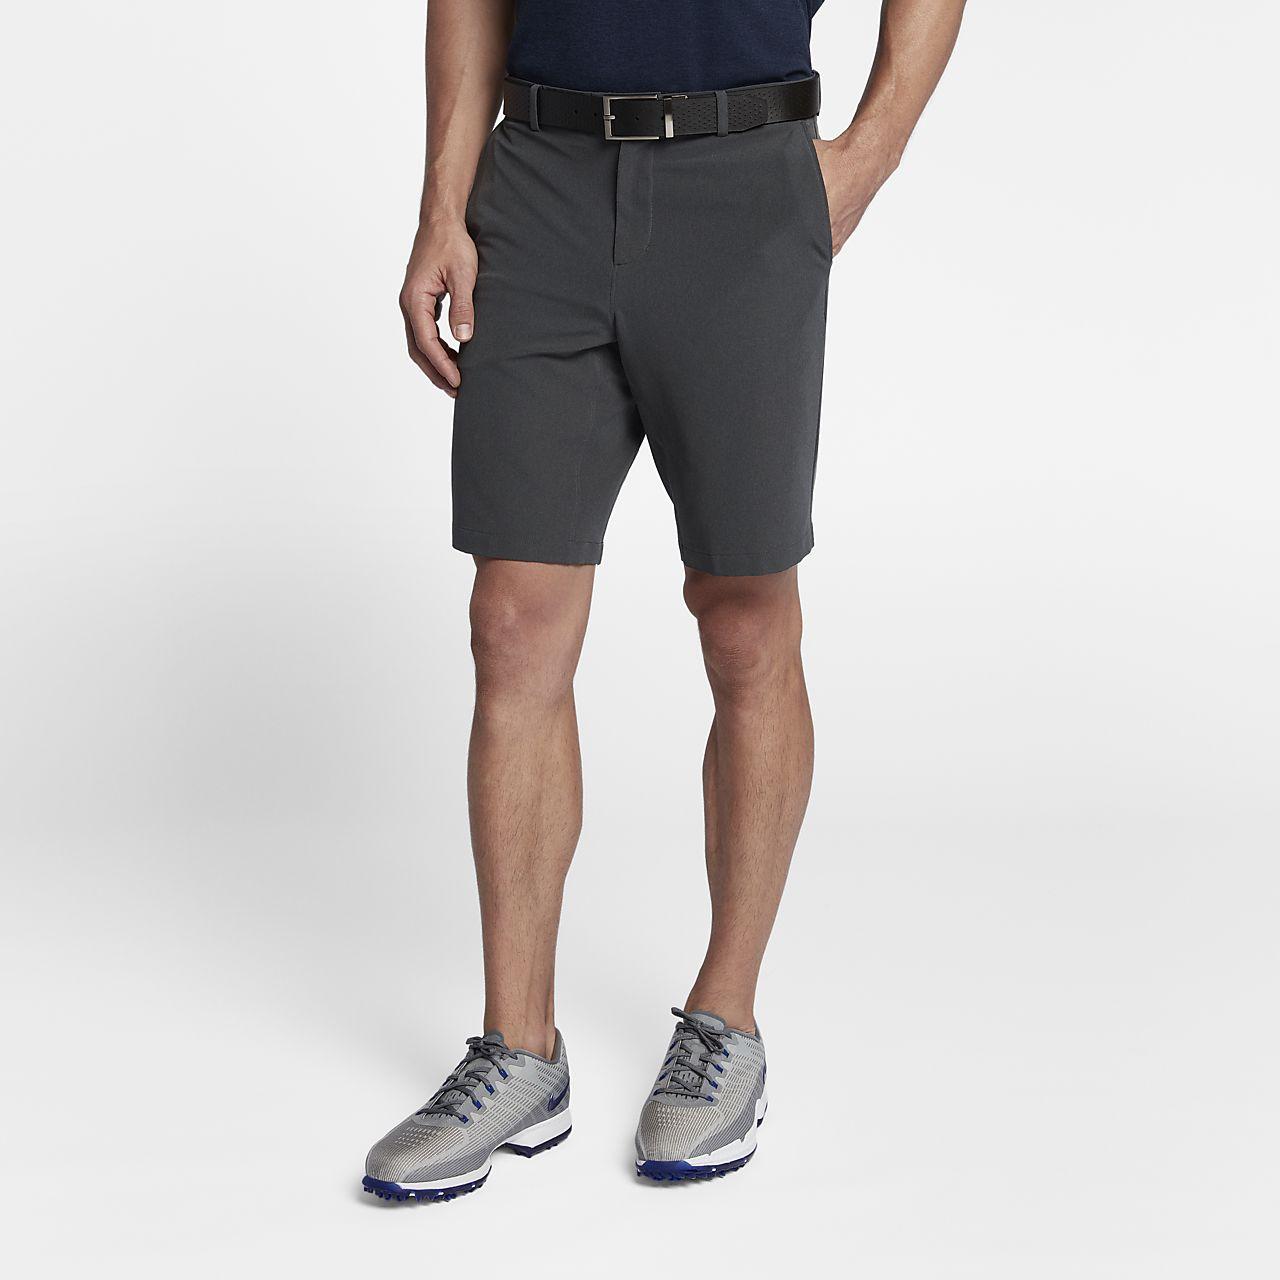 ... Nike Flex Hybrid Men's Standard Fit Golf Shorts